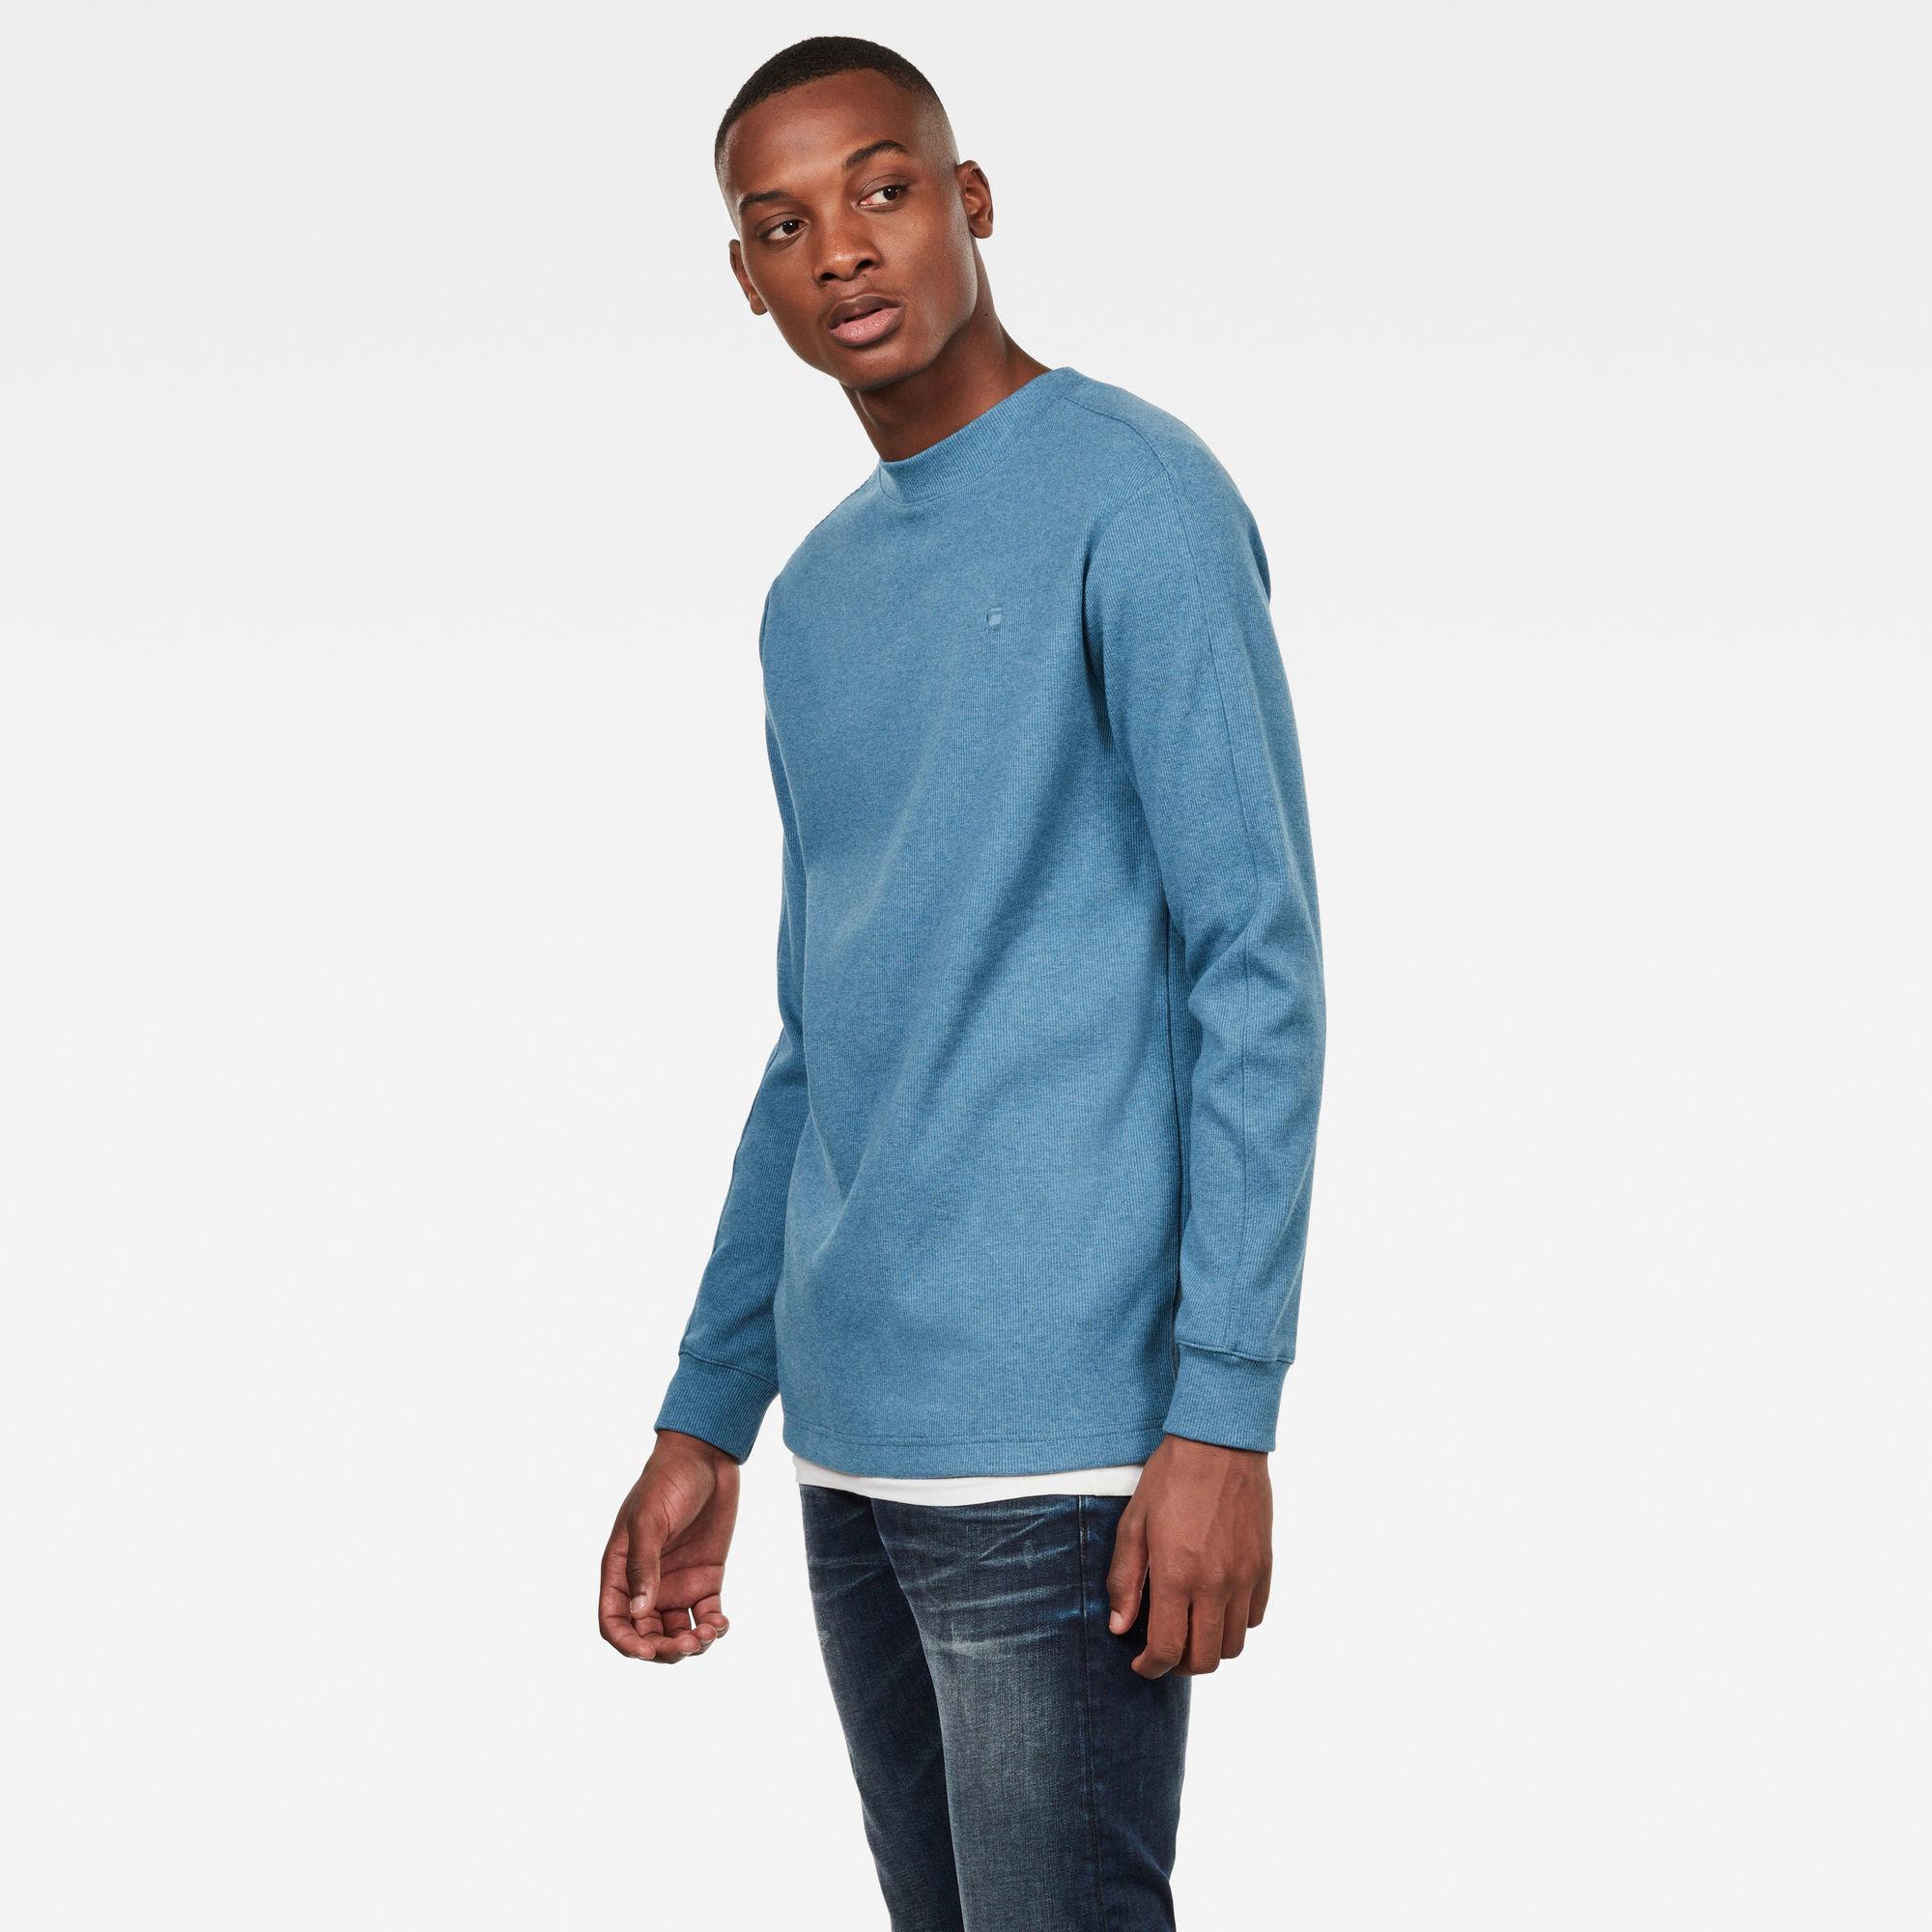 Korpaz Mock Sweater